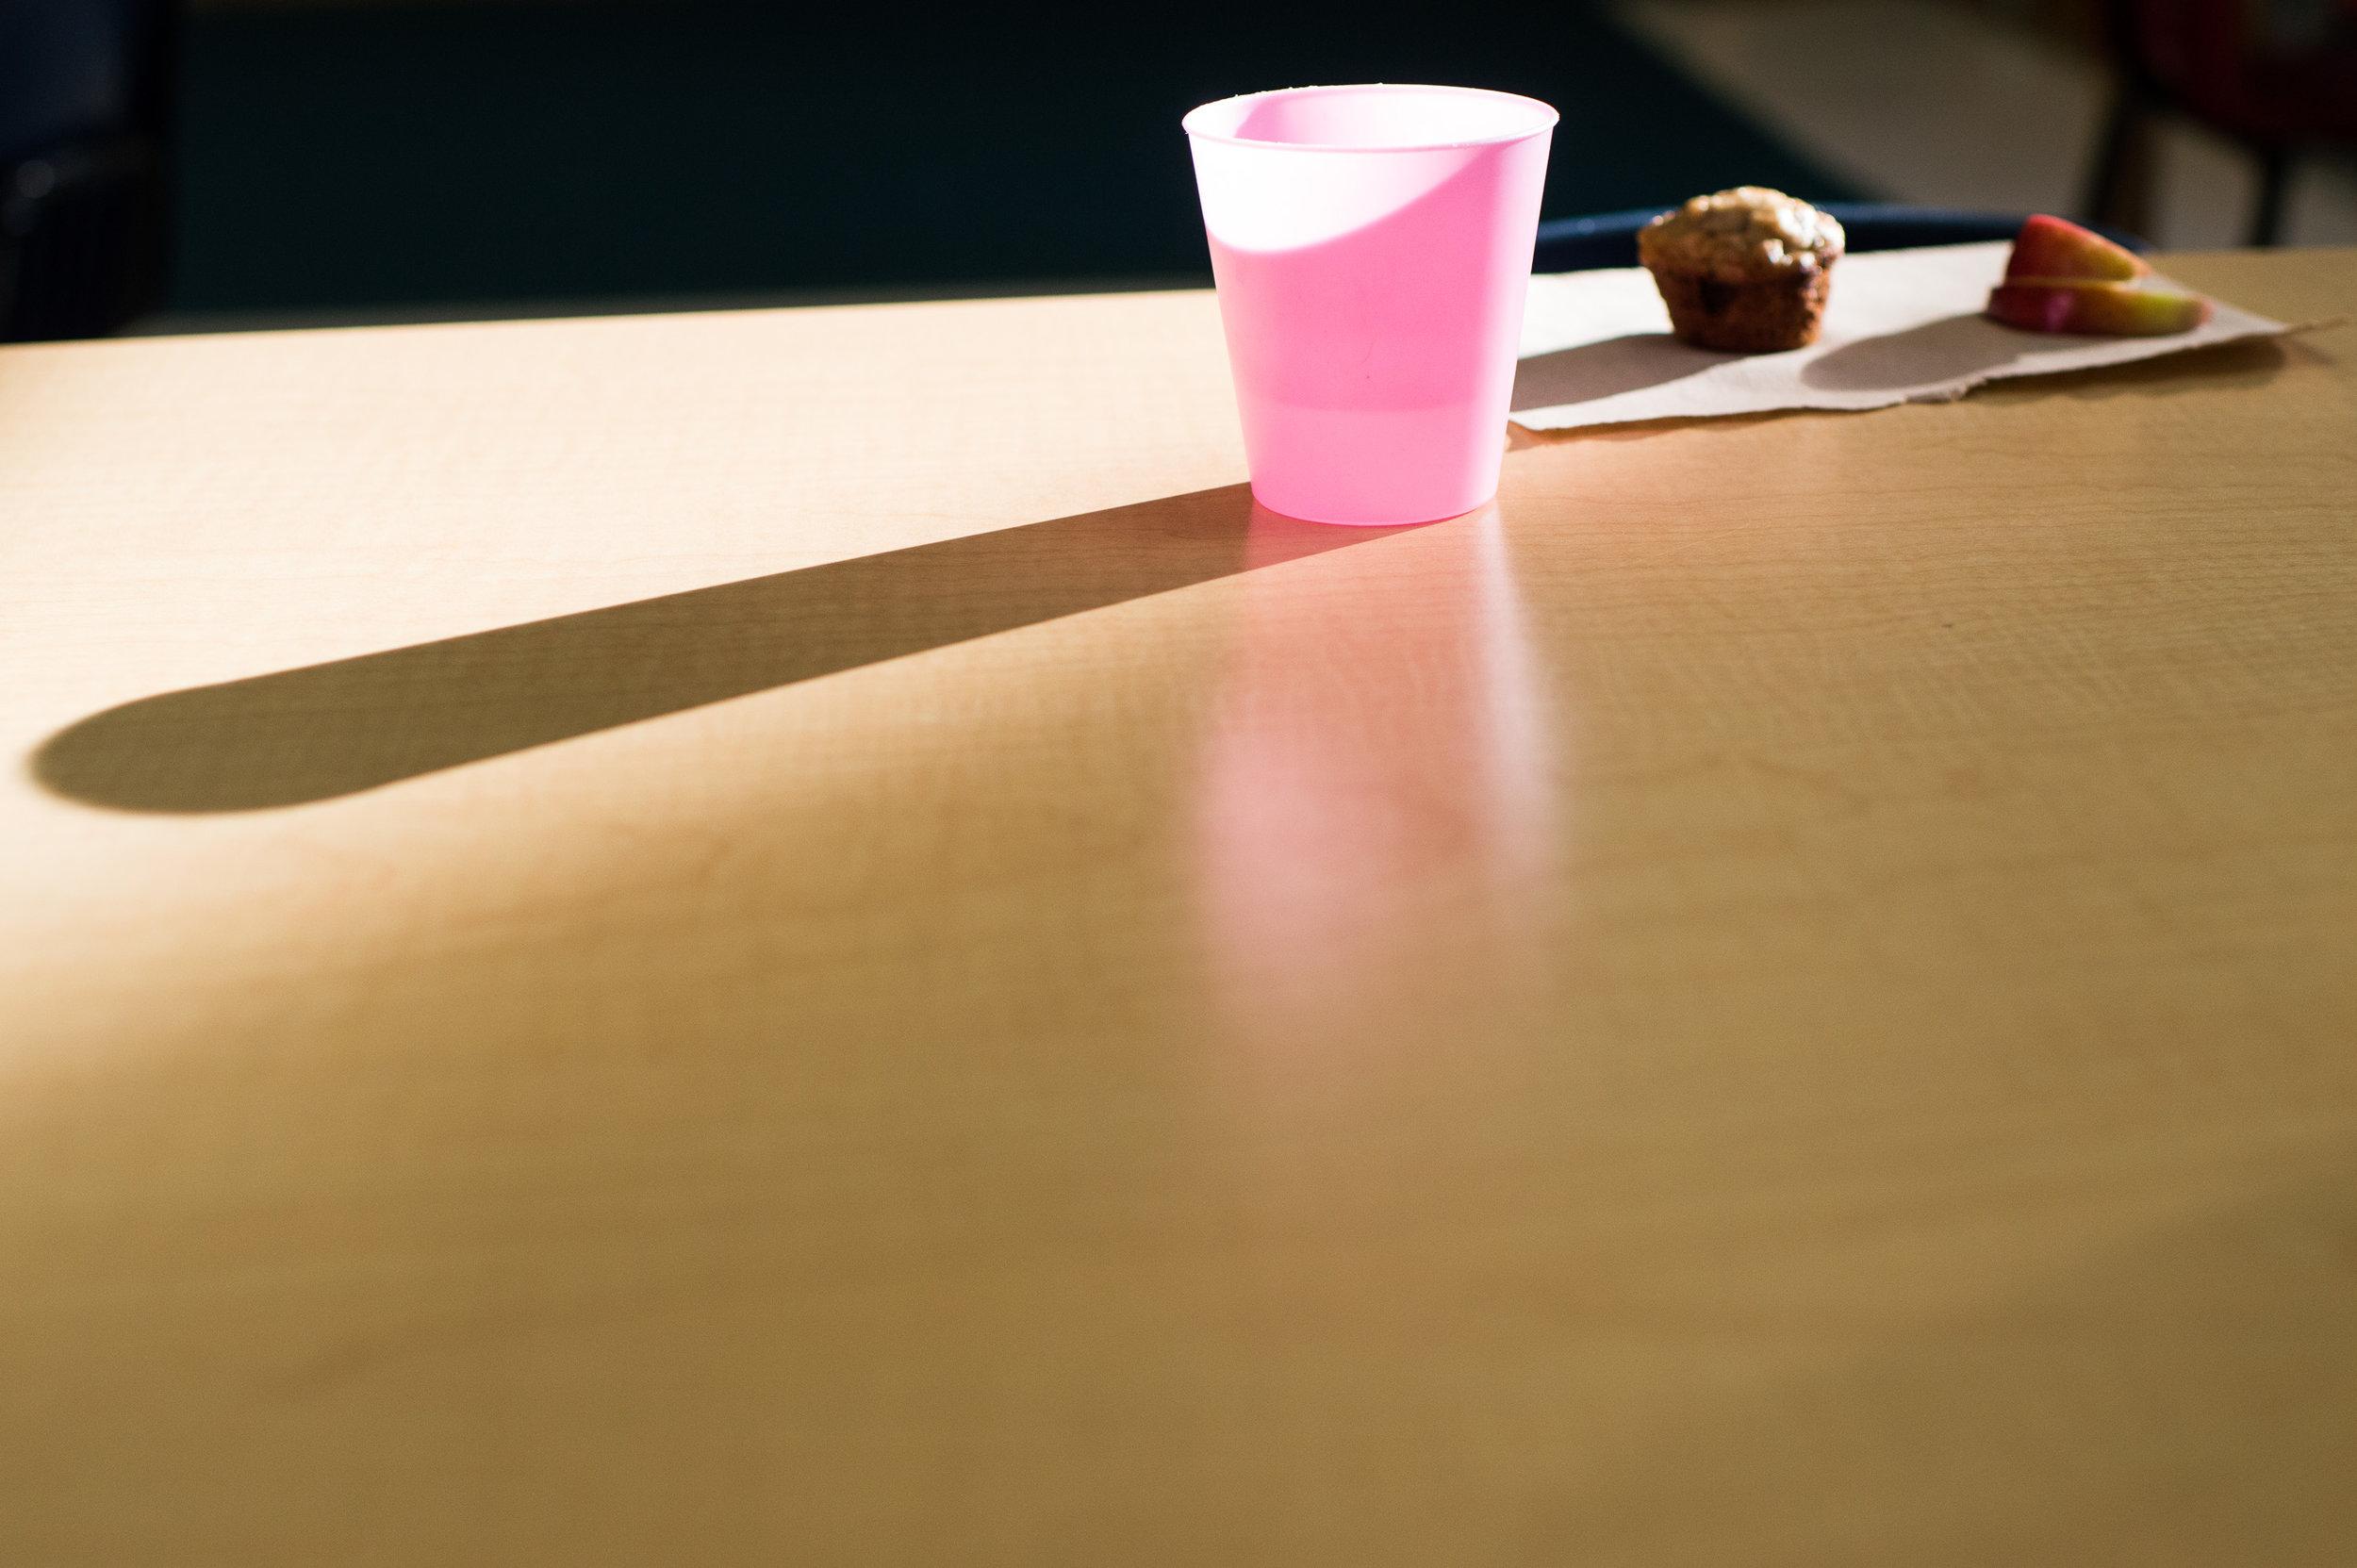 documentary school photography viara mileva kingston toronto ottawa-170337vm.jpg